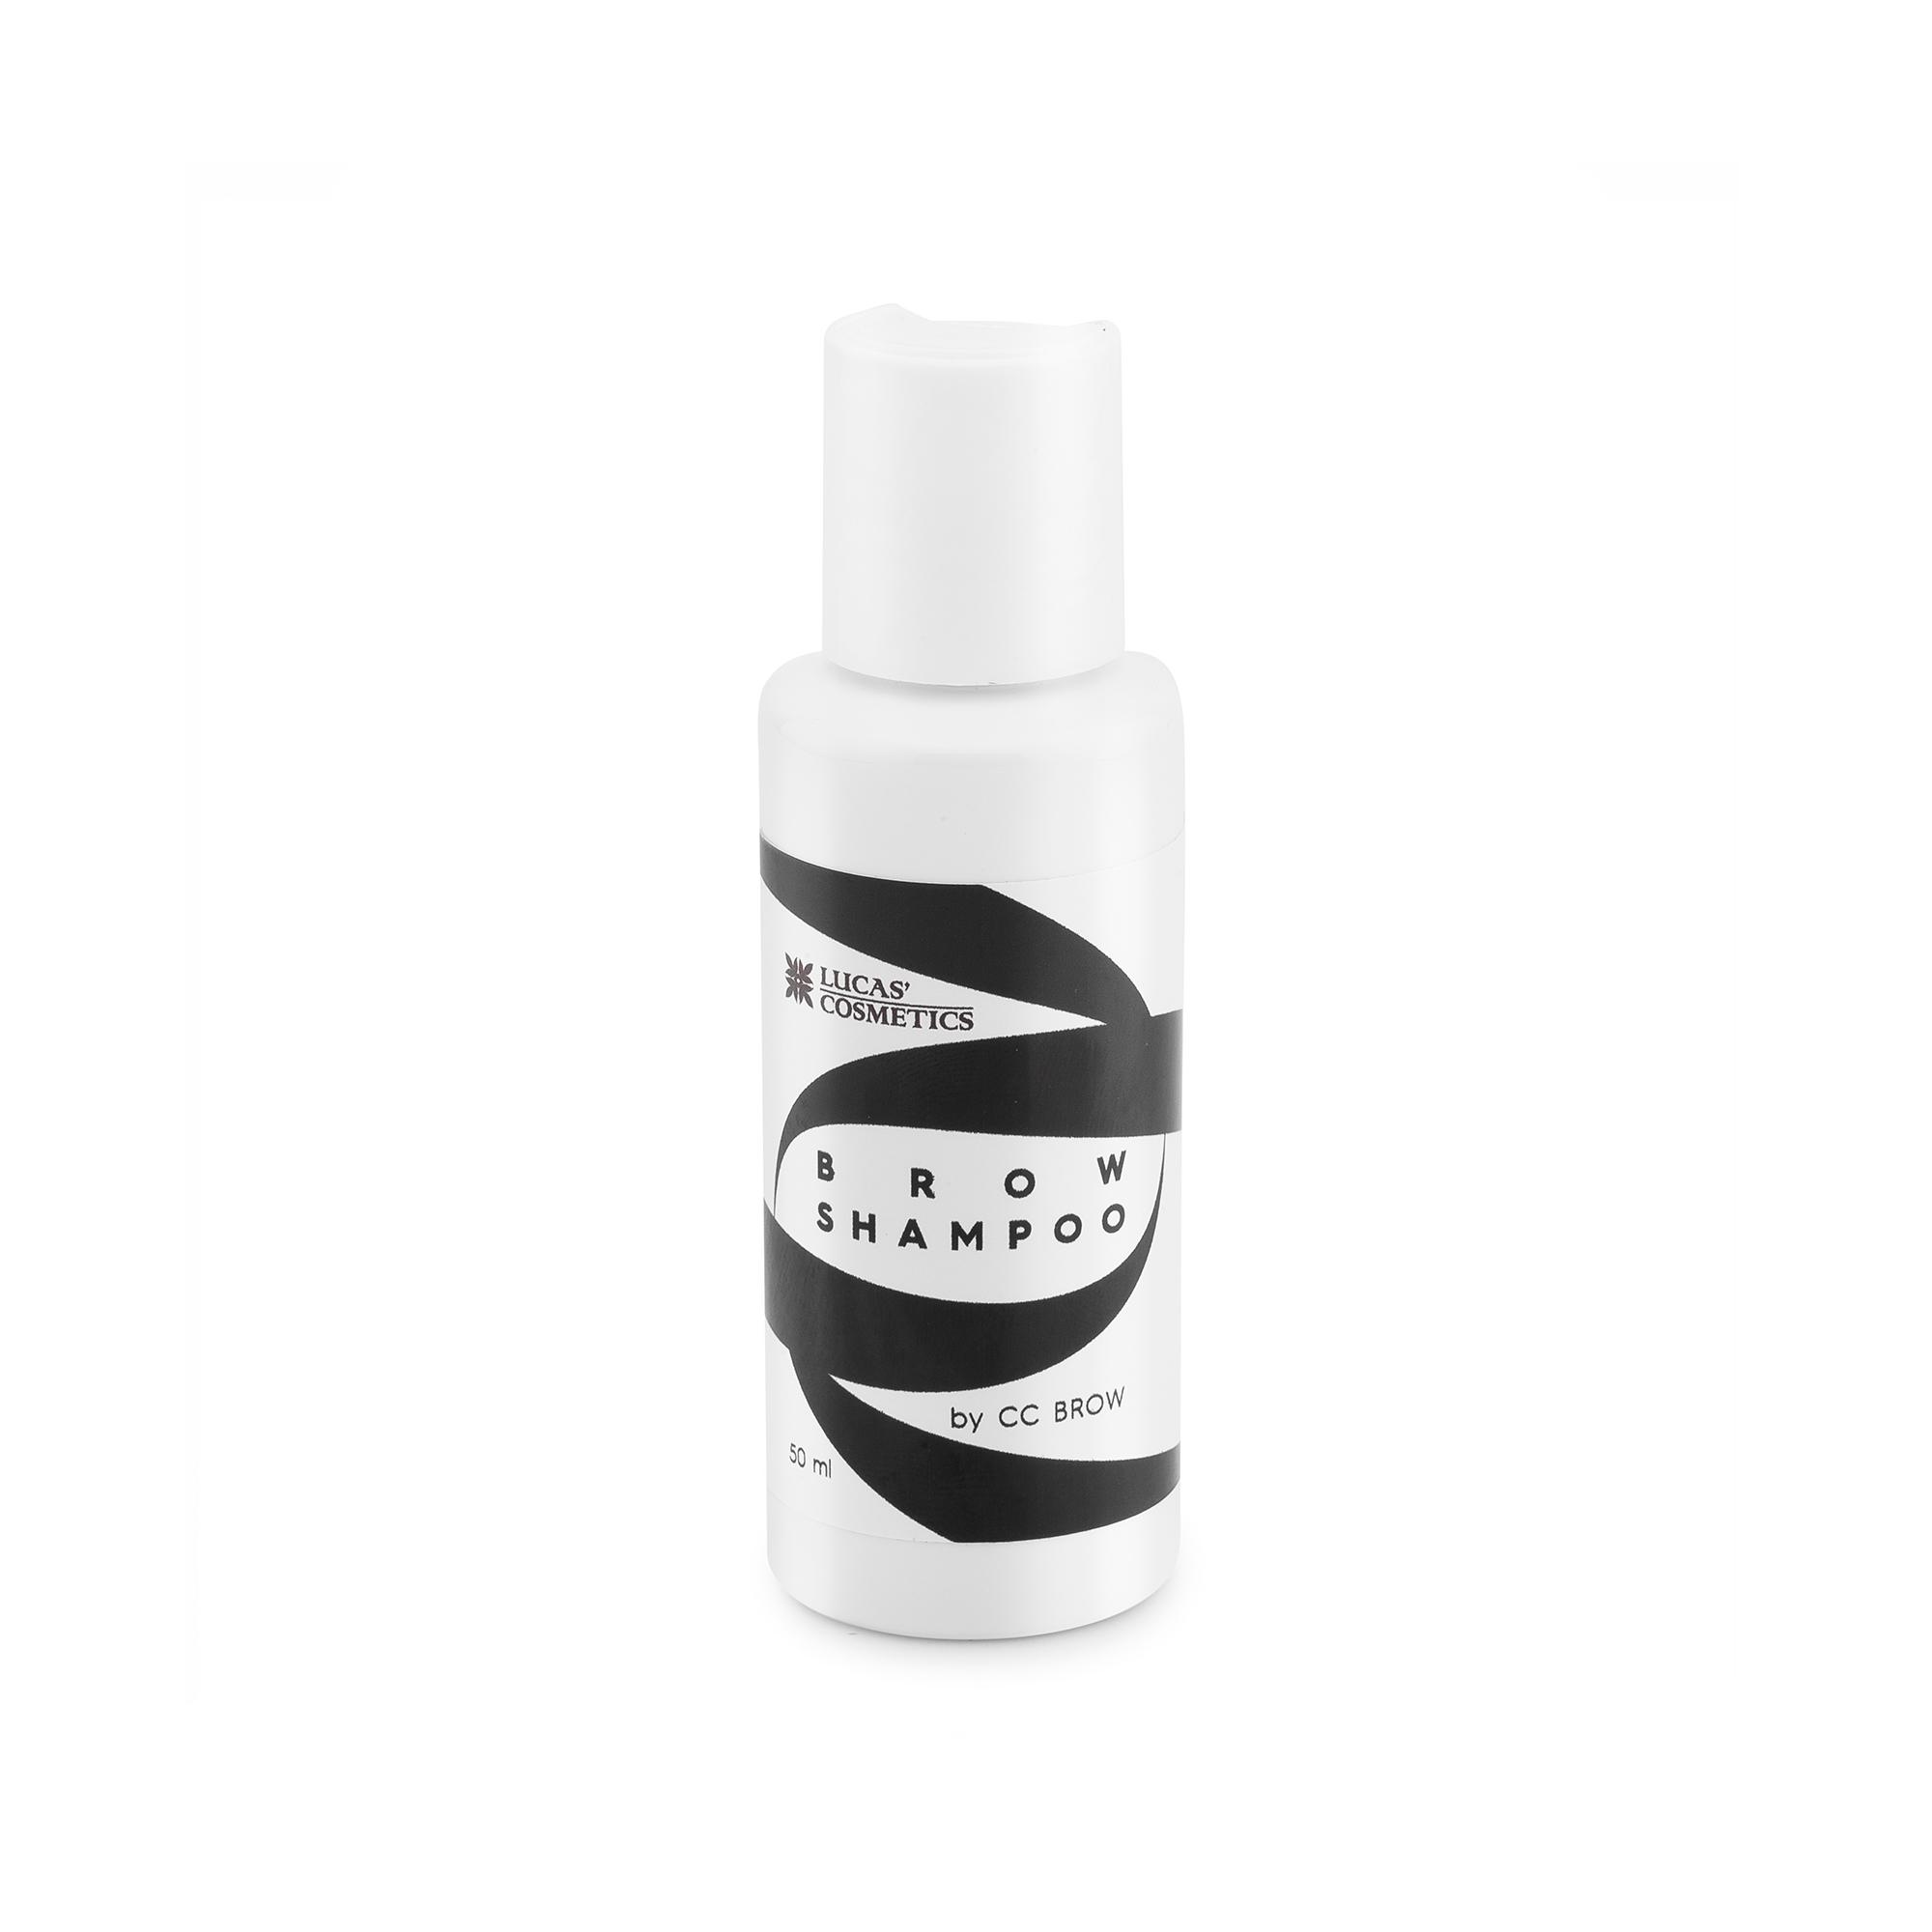 LUCAS' COSMETICS Шампунь для бровей / Brow Shampoo by CC Brow 50 мл